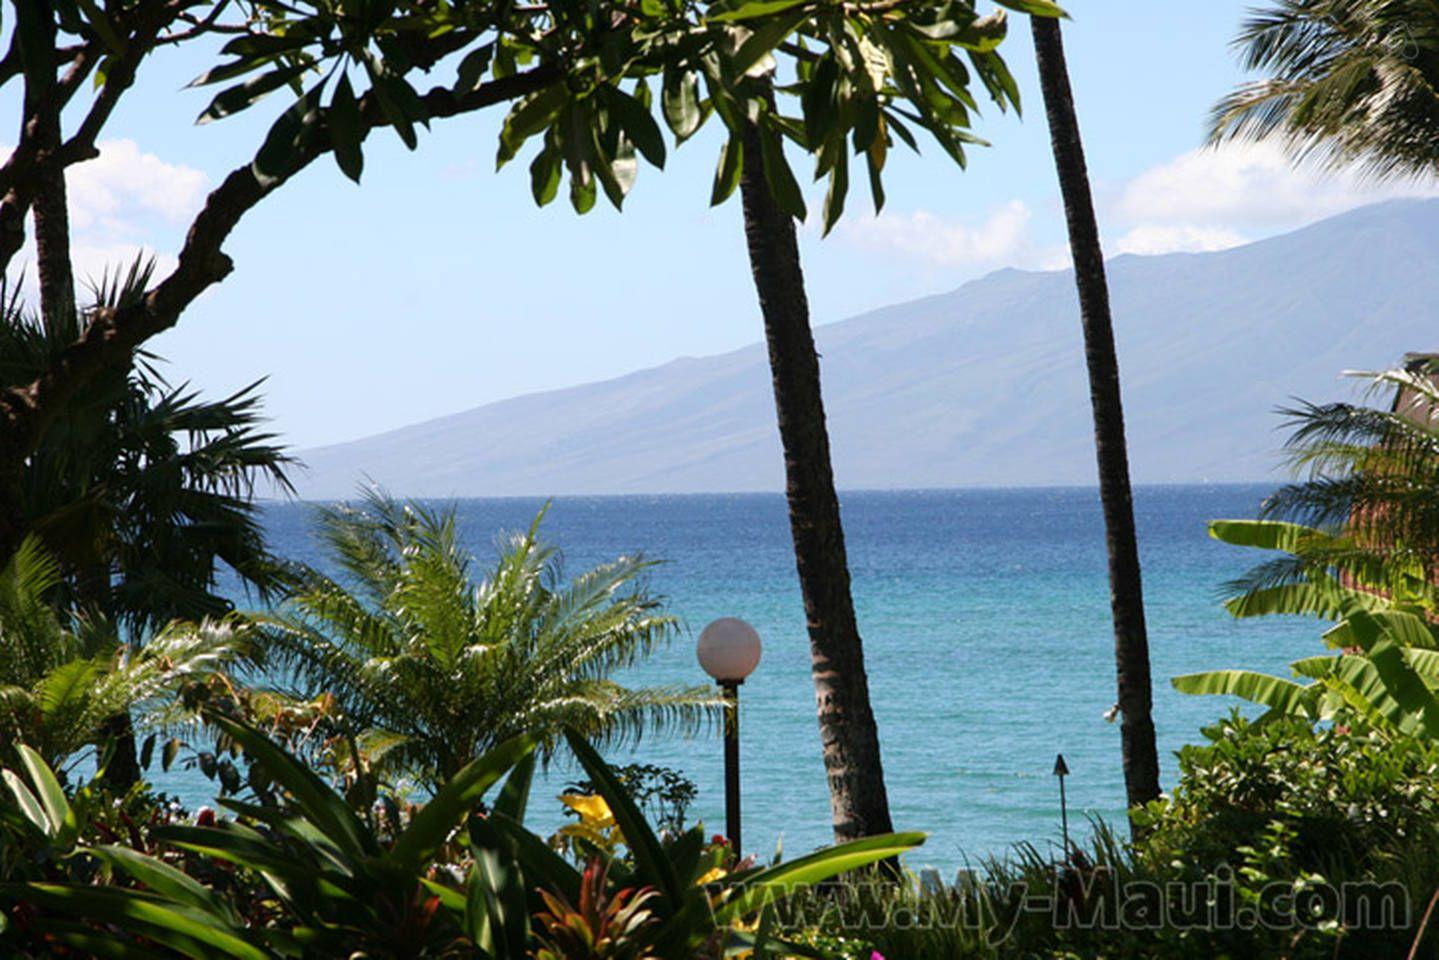 Ocean Front Luxury Condo, free WIFI - vacation rental in Maui, Hawaii. View more: #MauiHawaiiVacationRentals